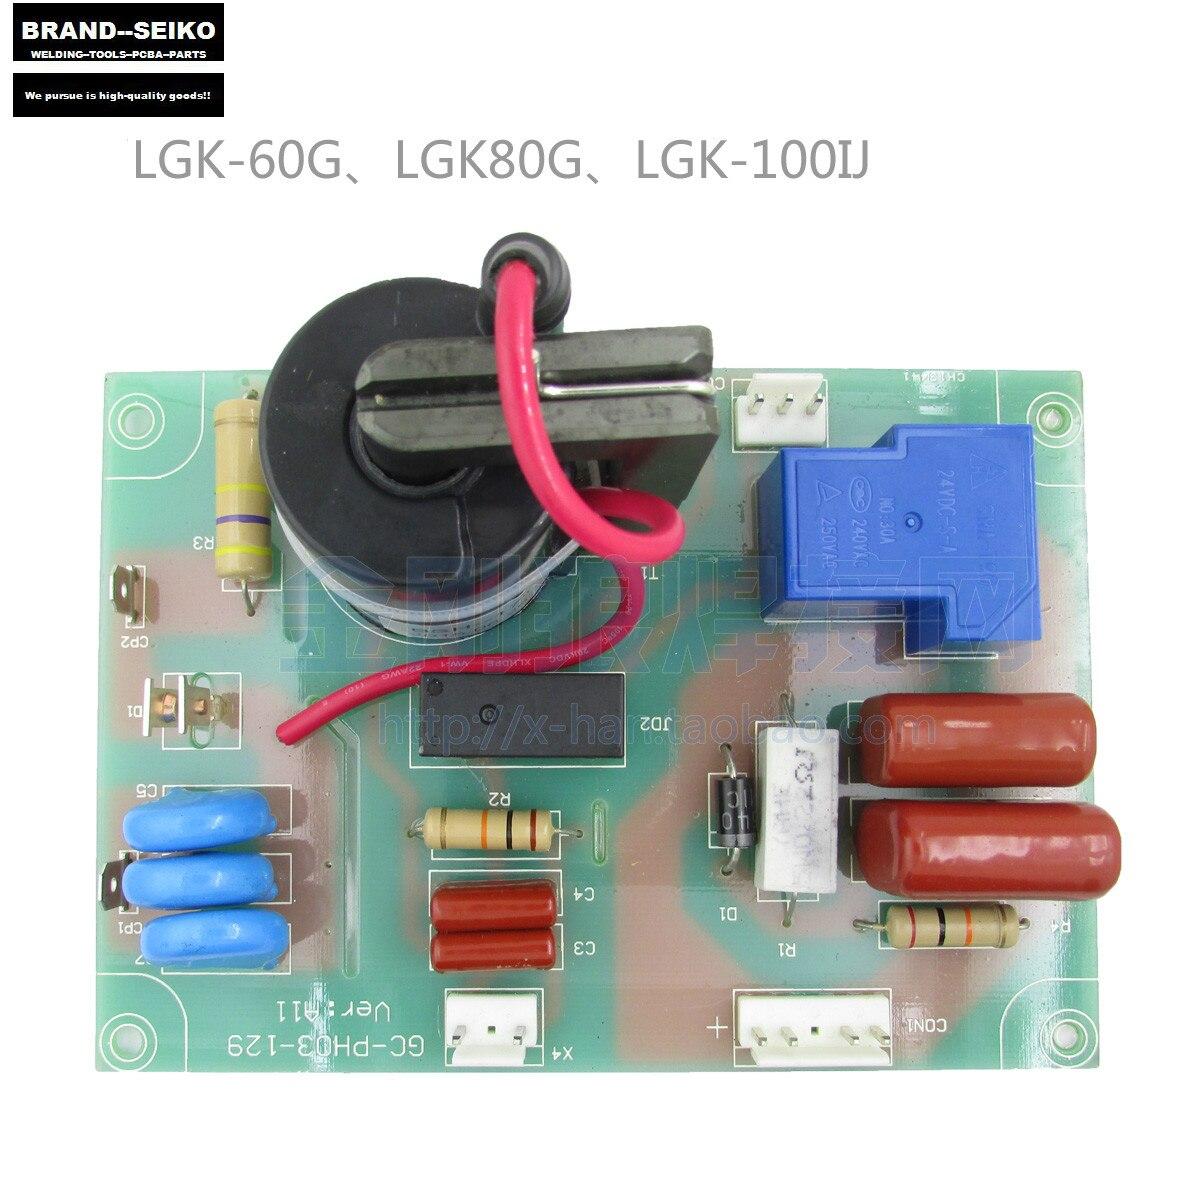 LGK LGK - 100-60 g ij LGK80G high frequency arc plasma cutting machine PCB board Nibbler